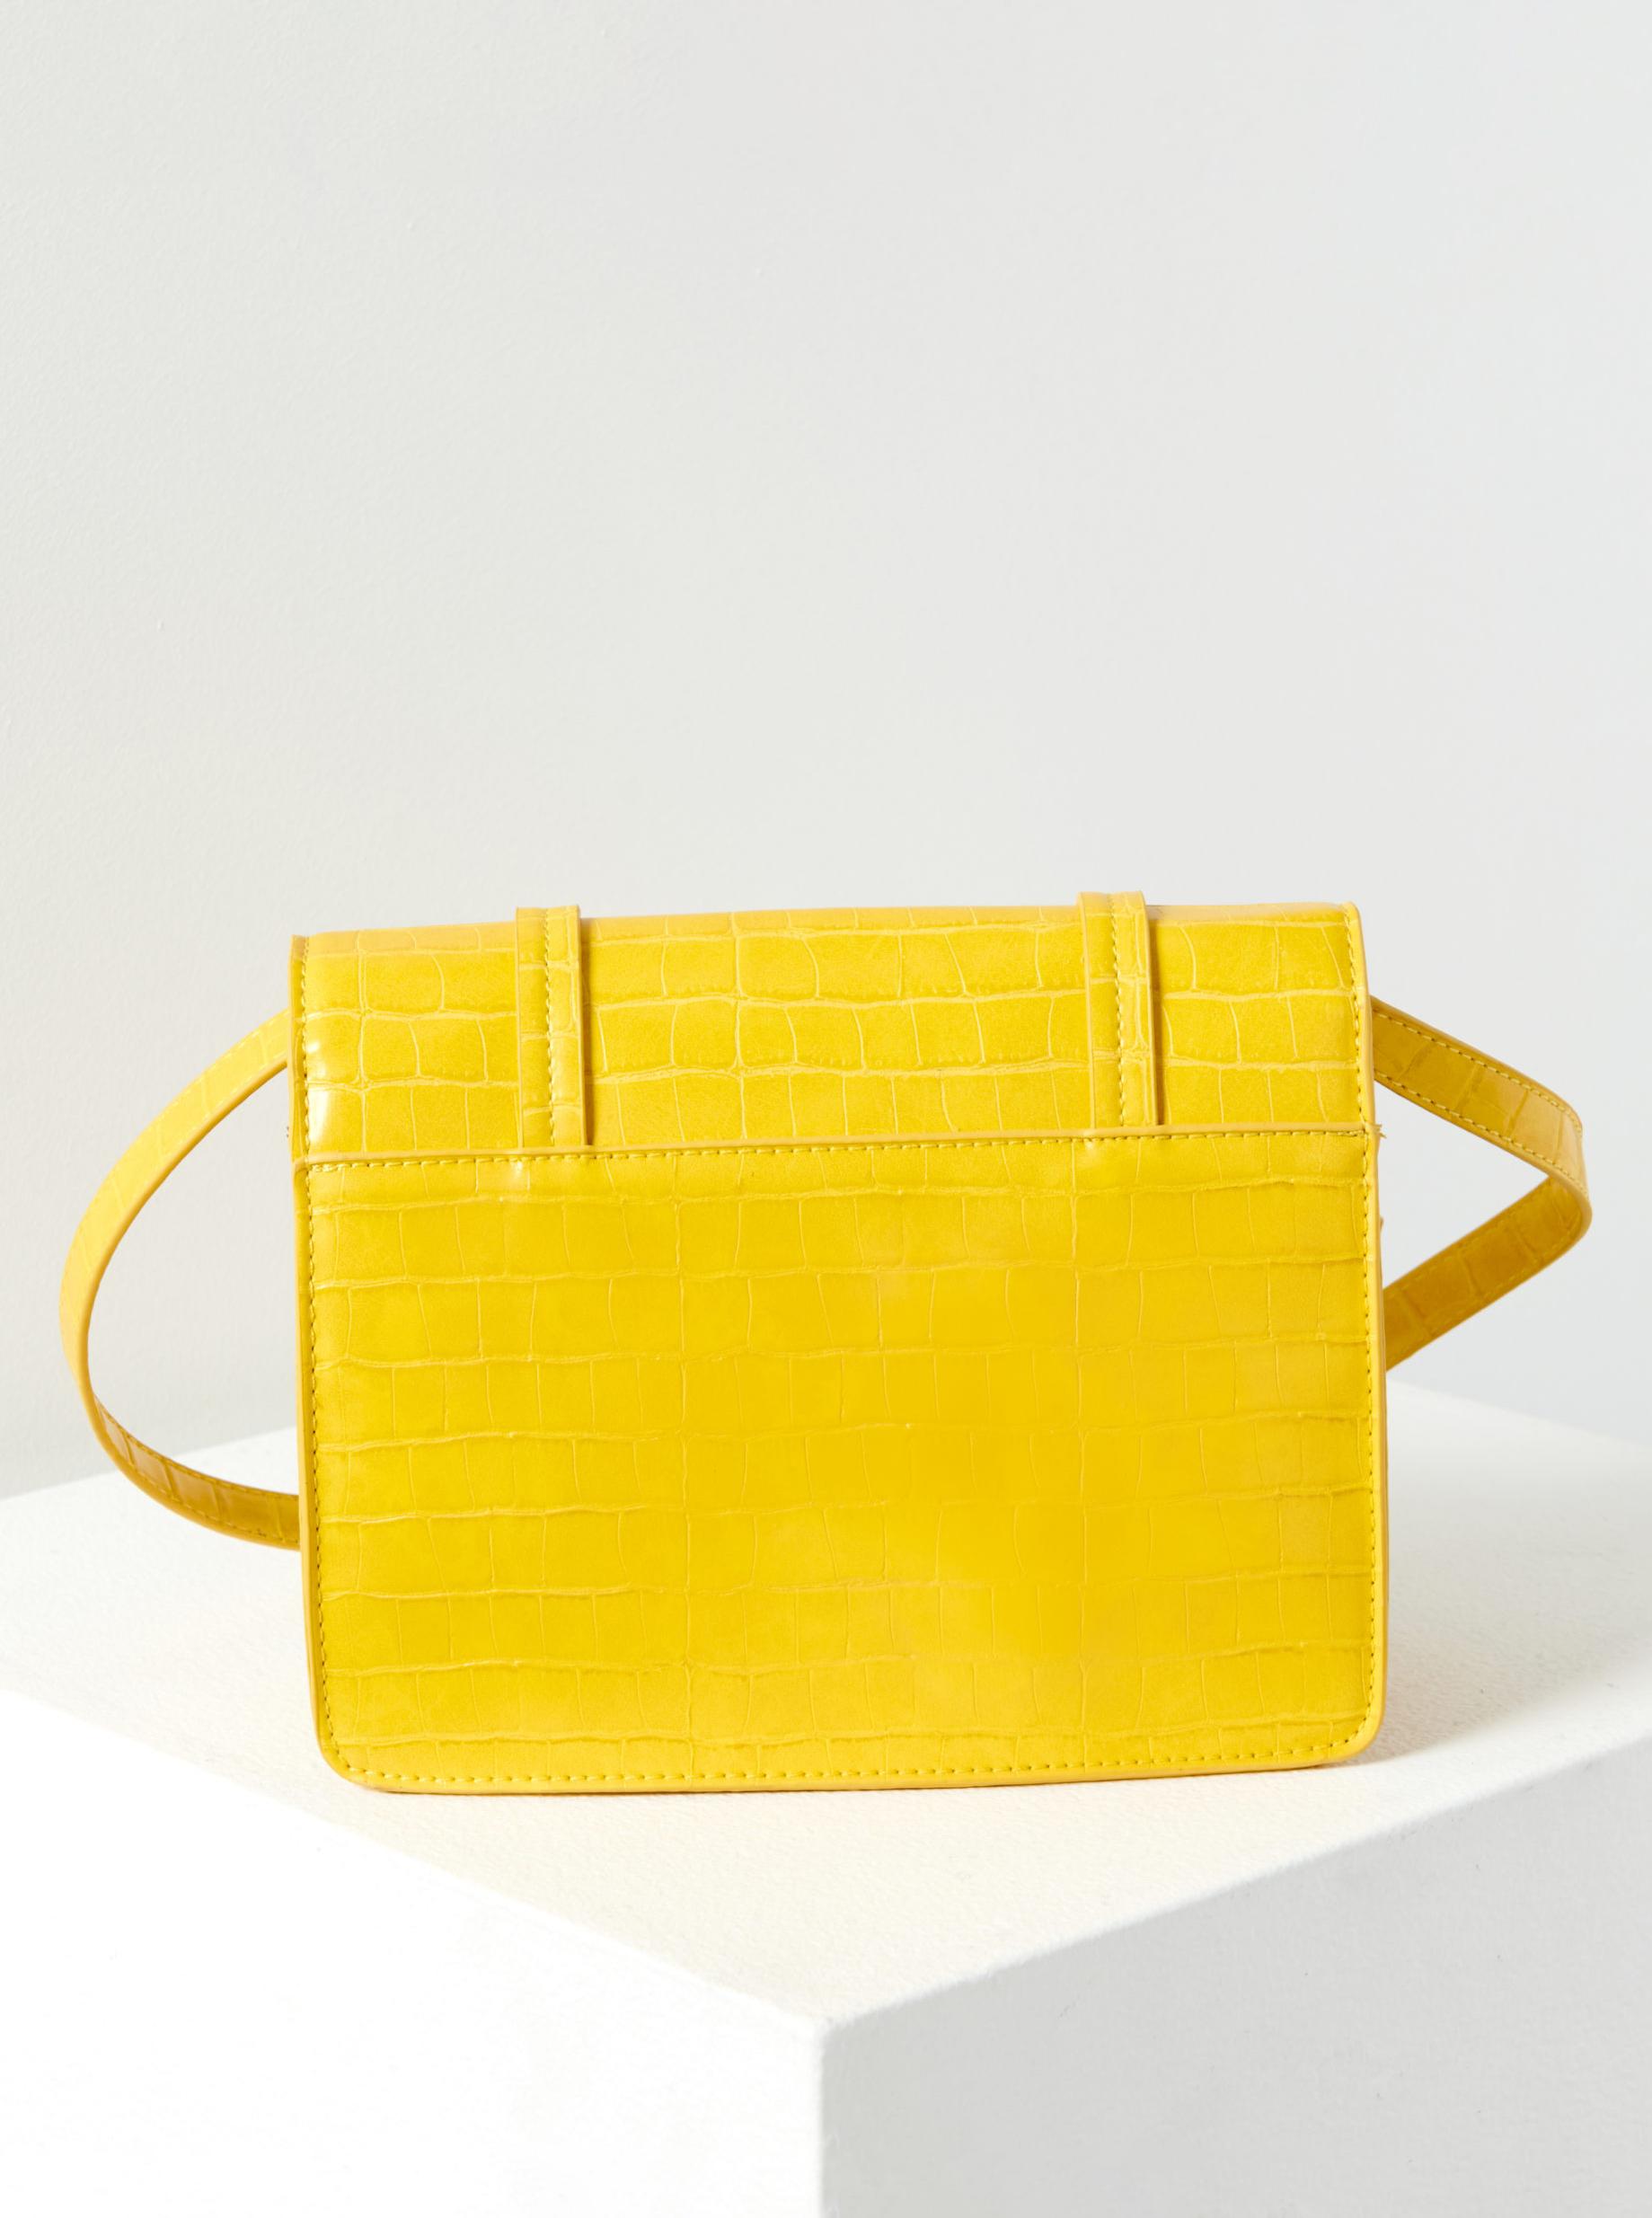 Žlutá crossbody kabelka s krokodýlím vzorem CAMAIEU